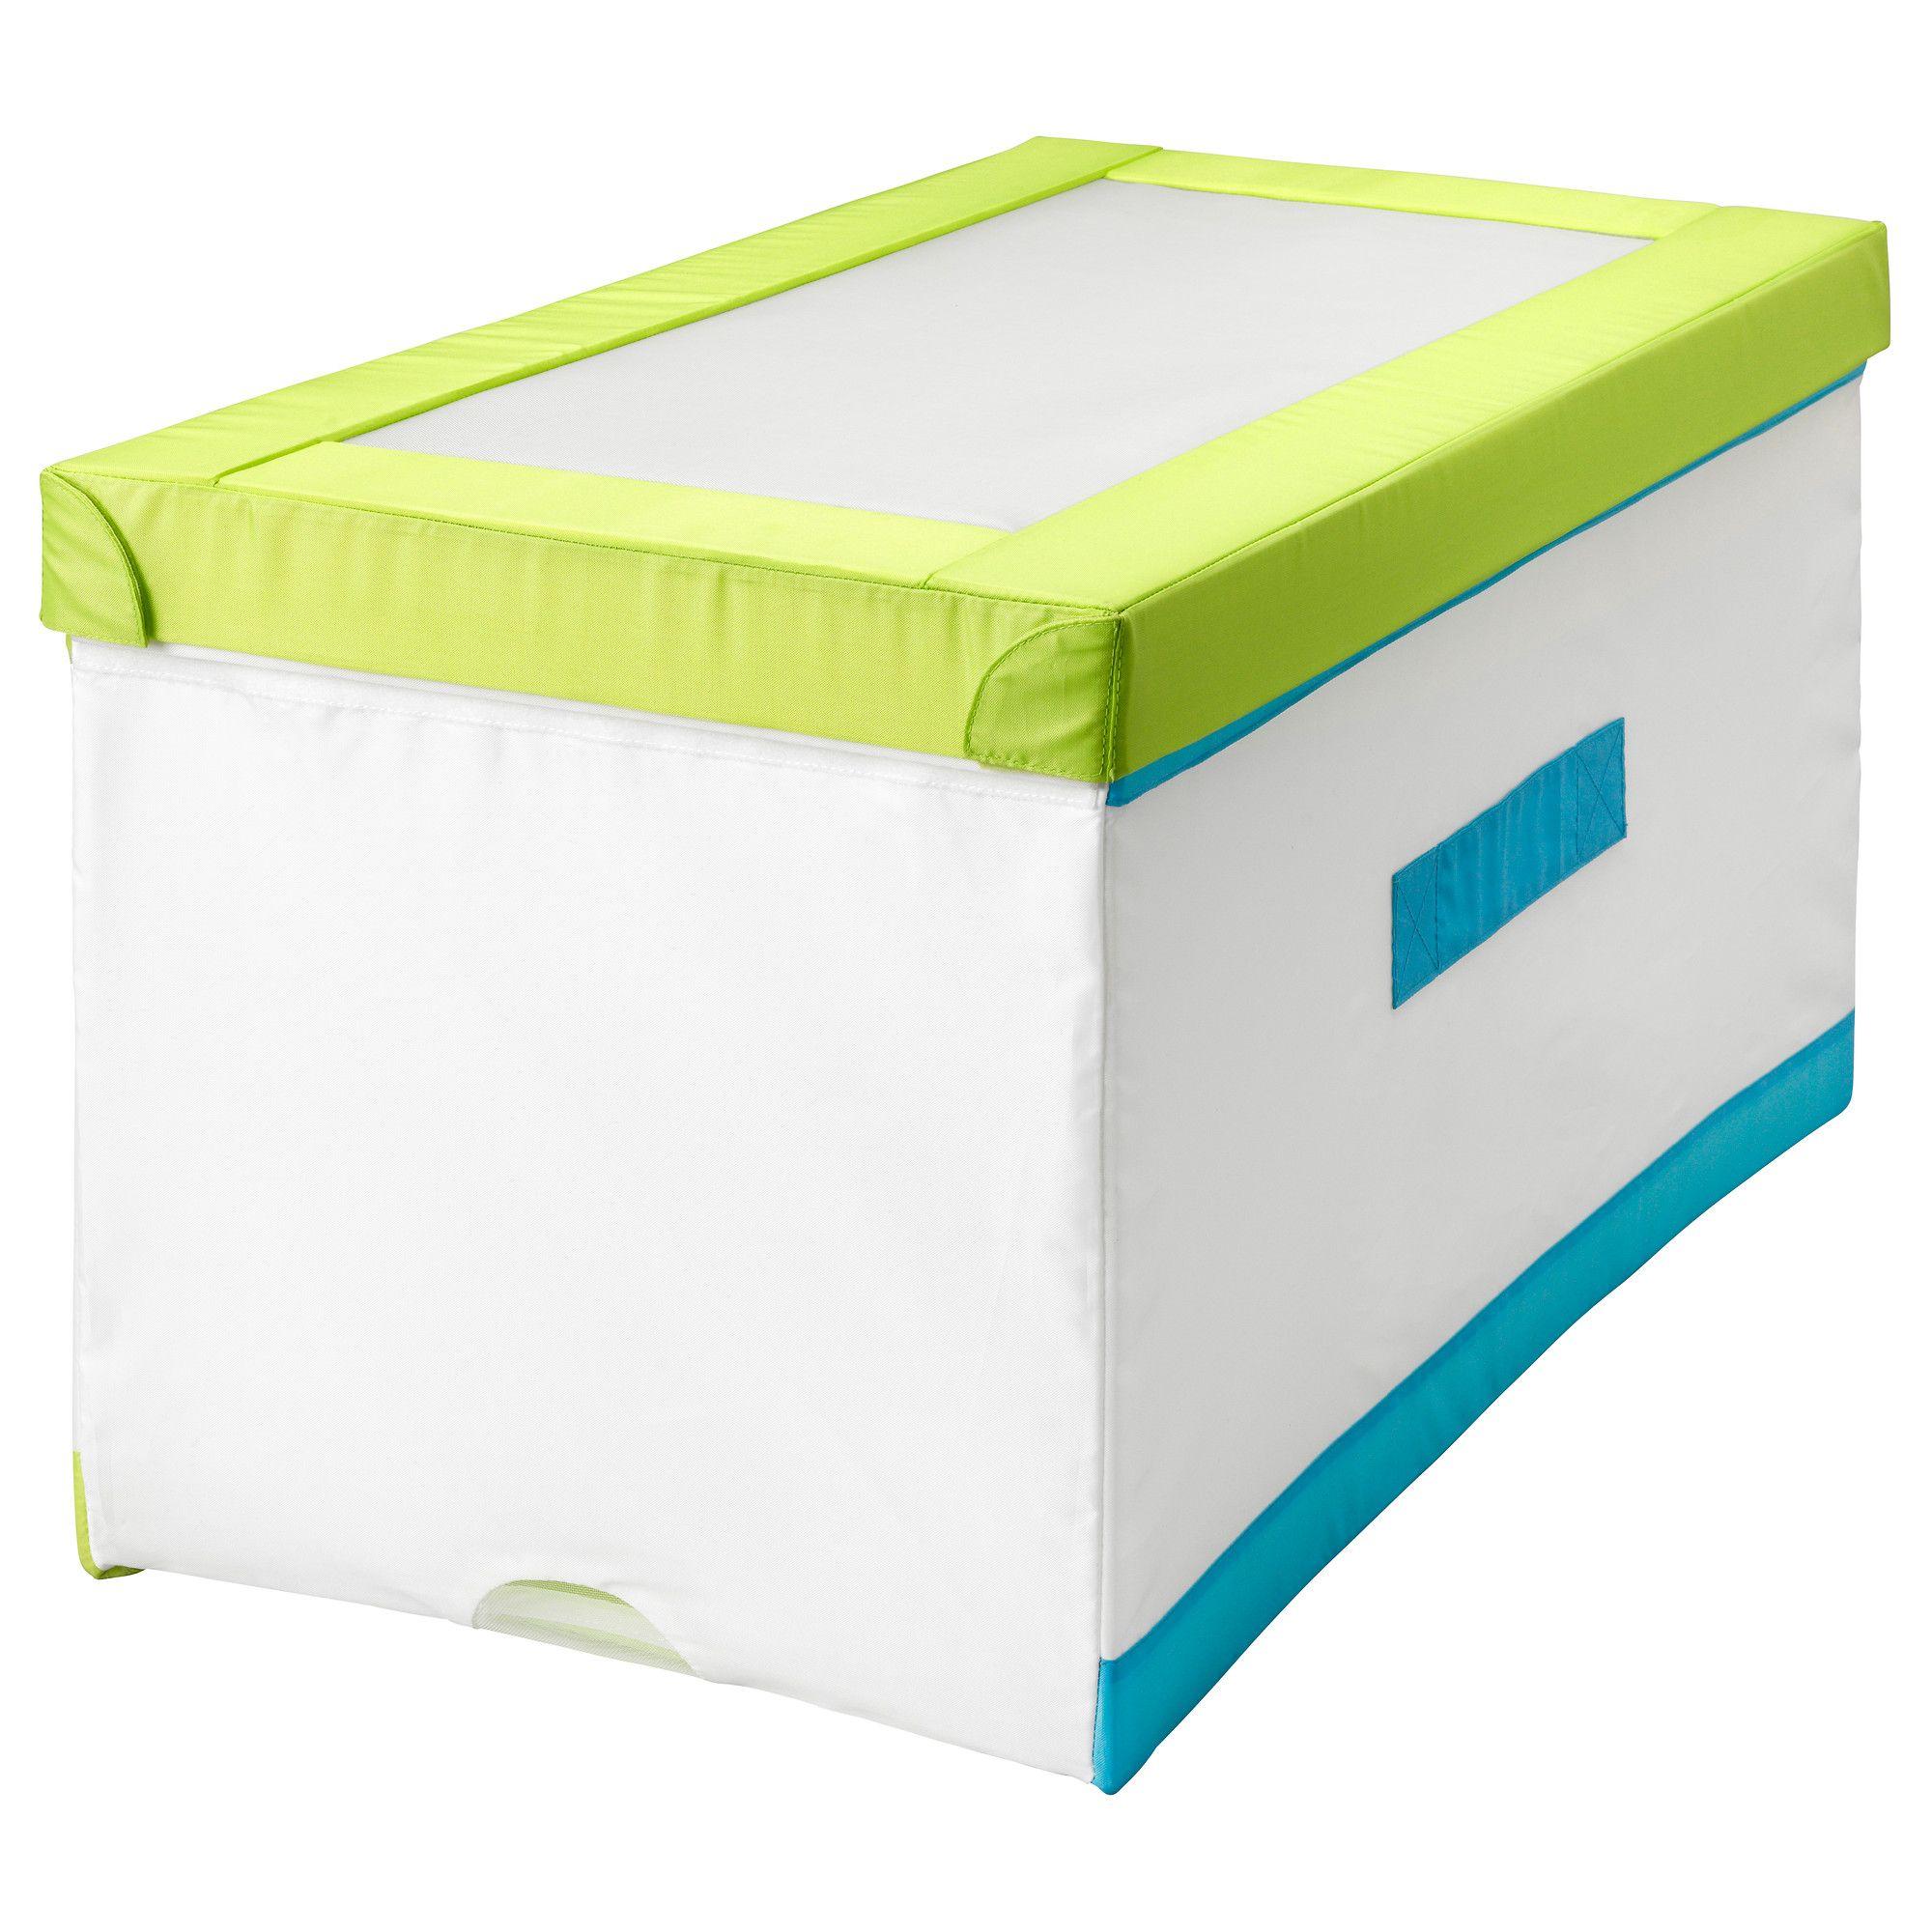 Ikea Us Furniture And Home Furnishings Ikea Boxes Toy Storage